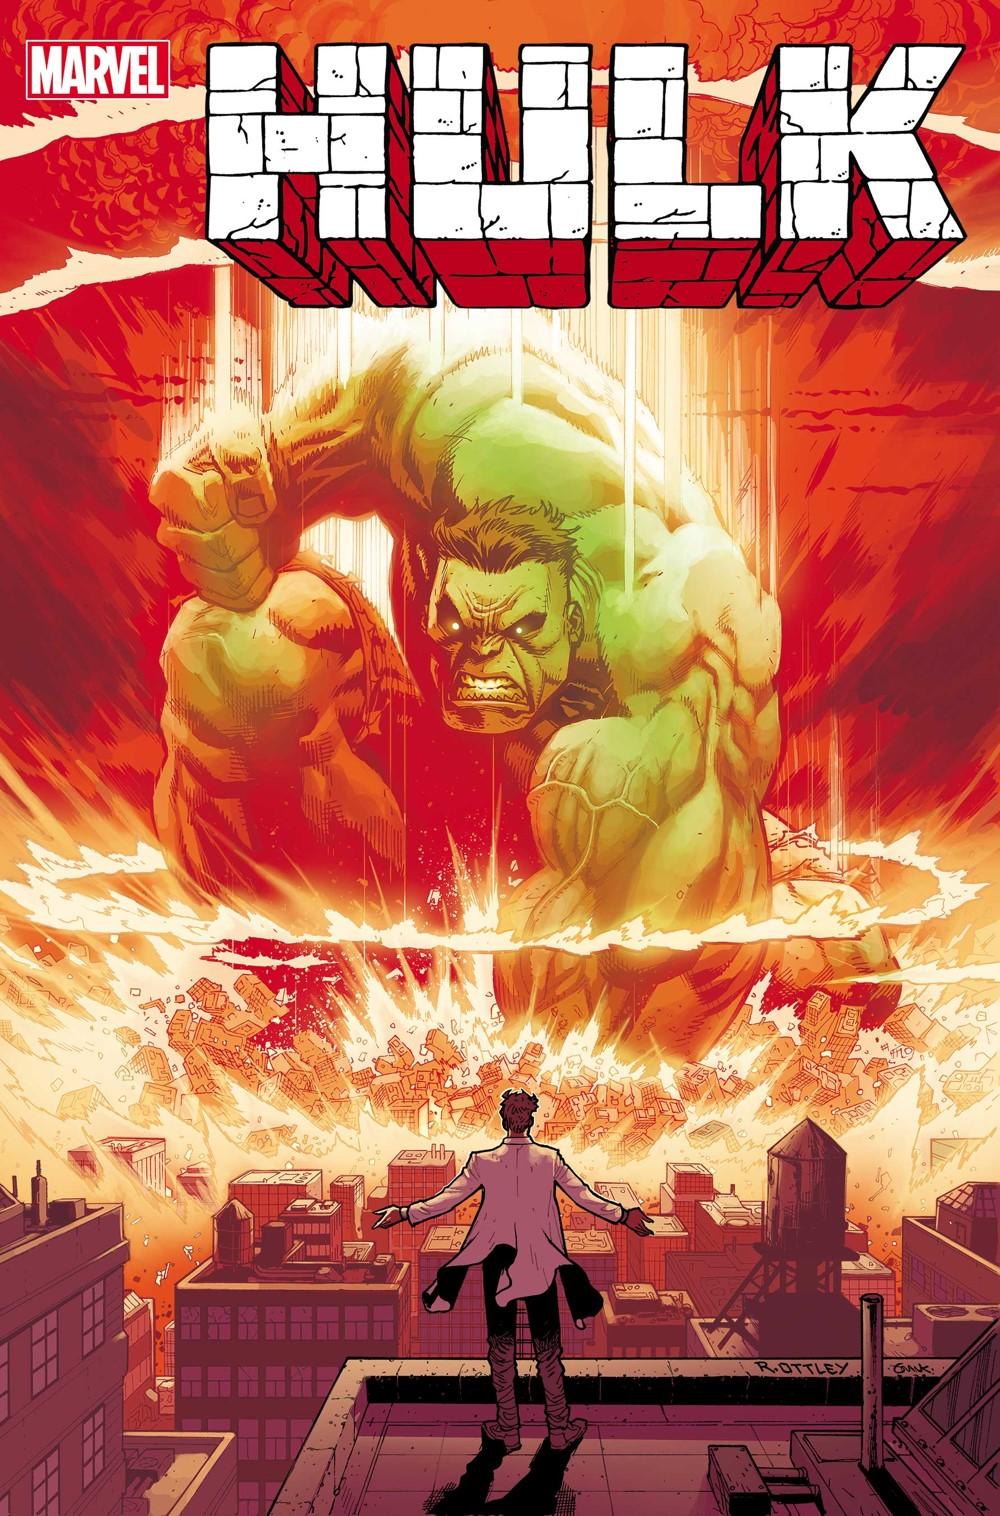 HULK2021001_cov Marvel Comics November 2021 Solicitations